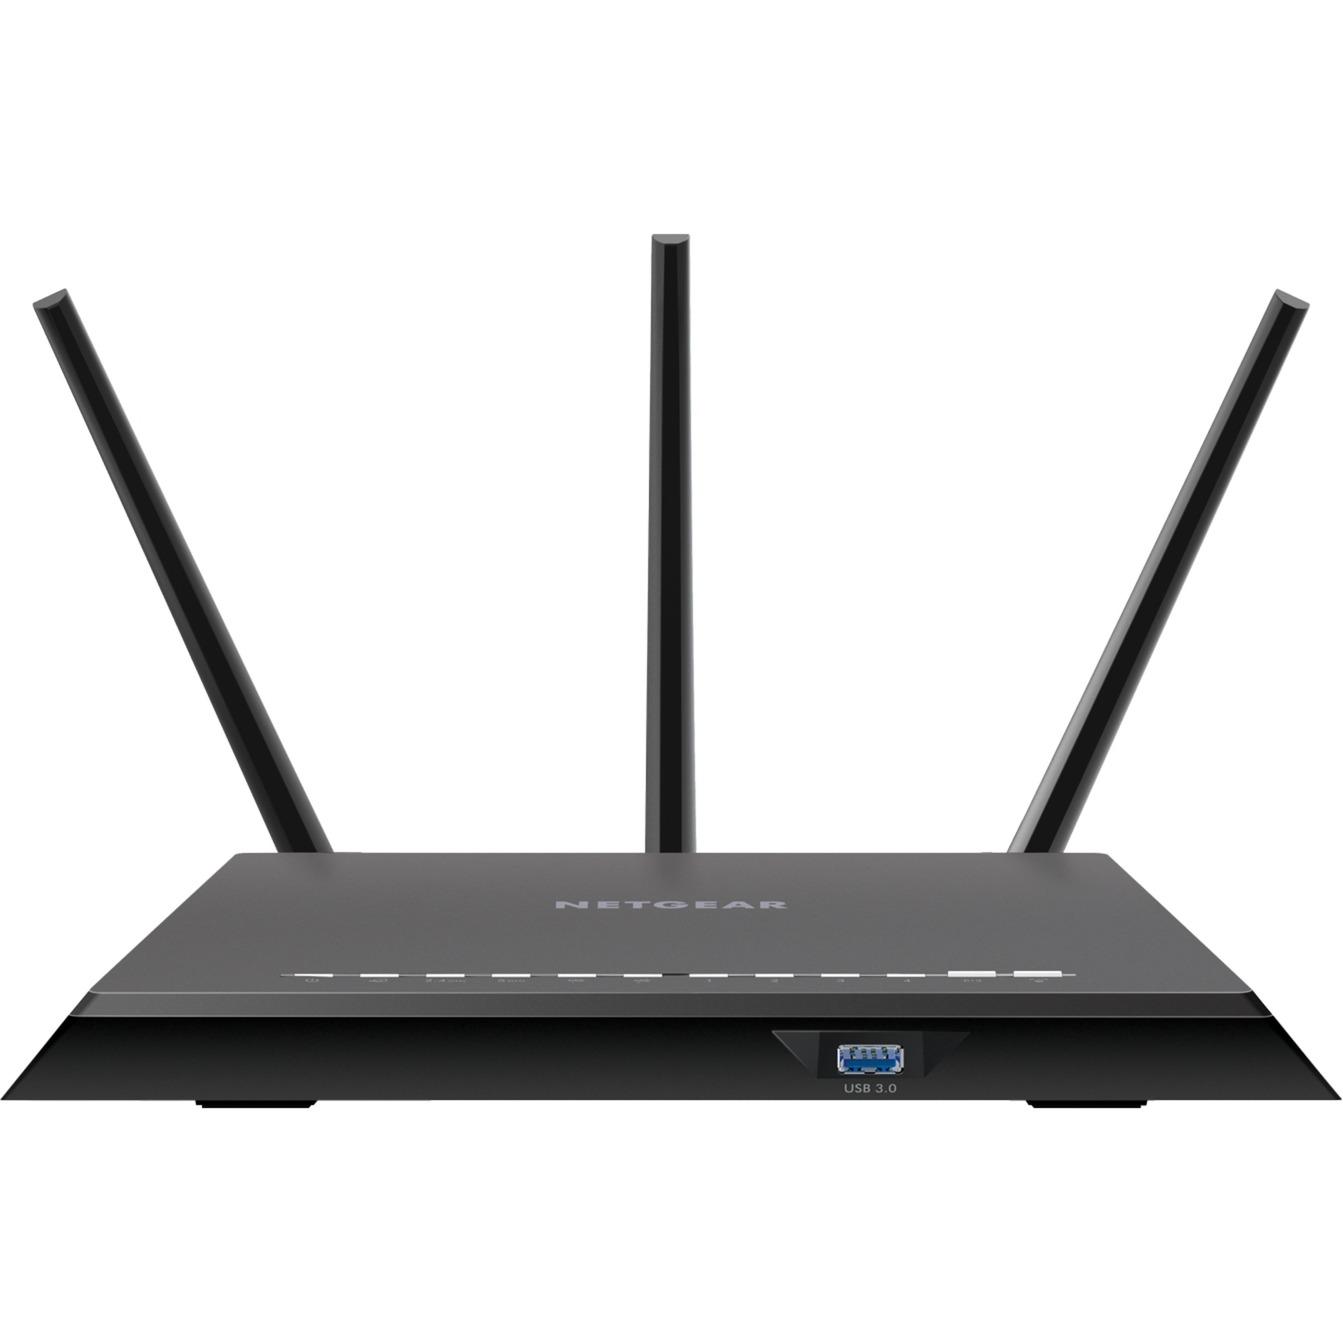 R7000P Nighthawk AC2300 Smart WiFi Router + MU, Routeur